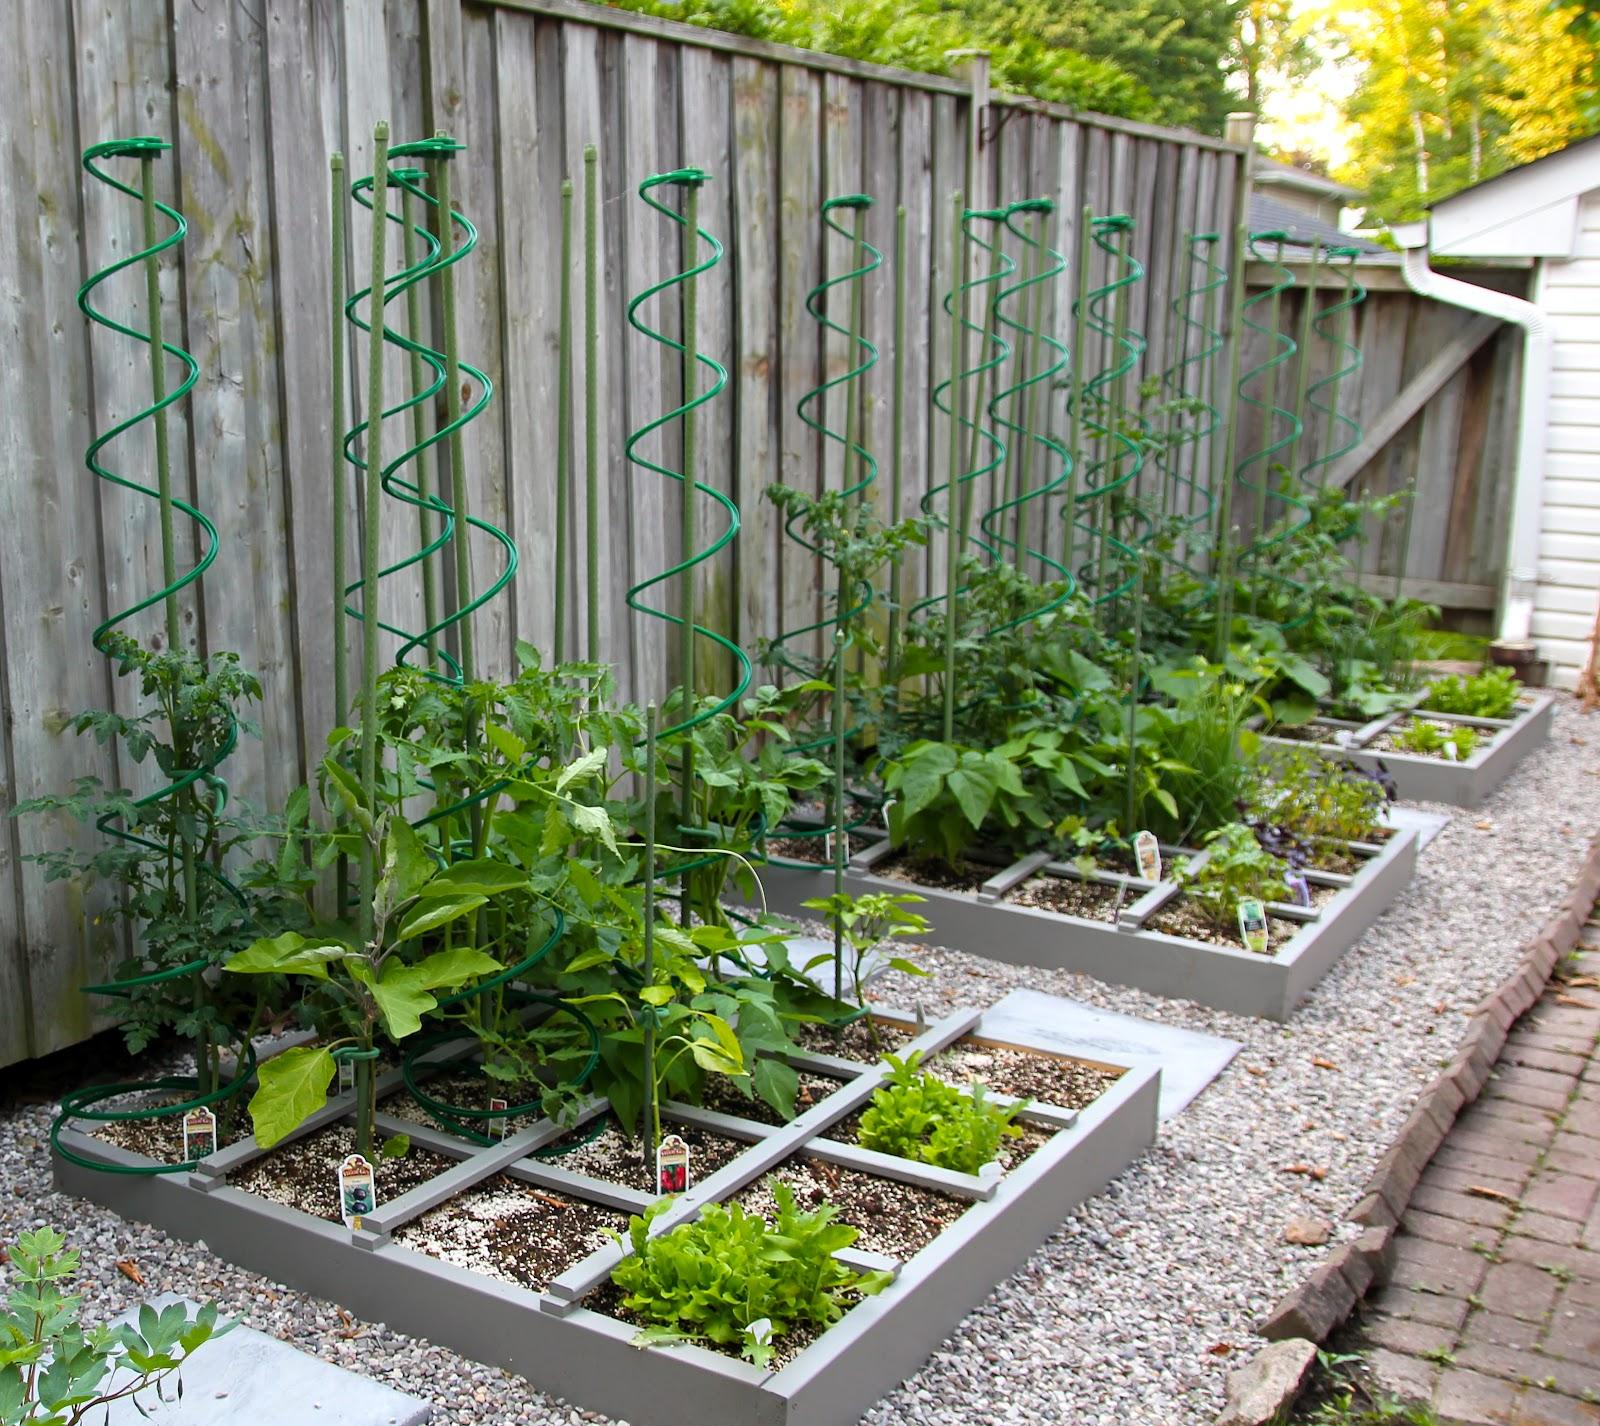 fiberchick nqr square foot gardening. Black Bedroom Furniture Sets. Home Design Ideas